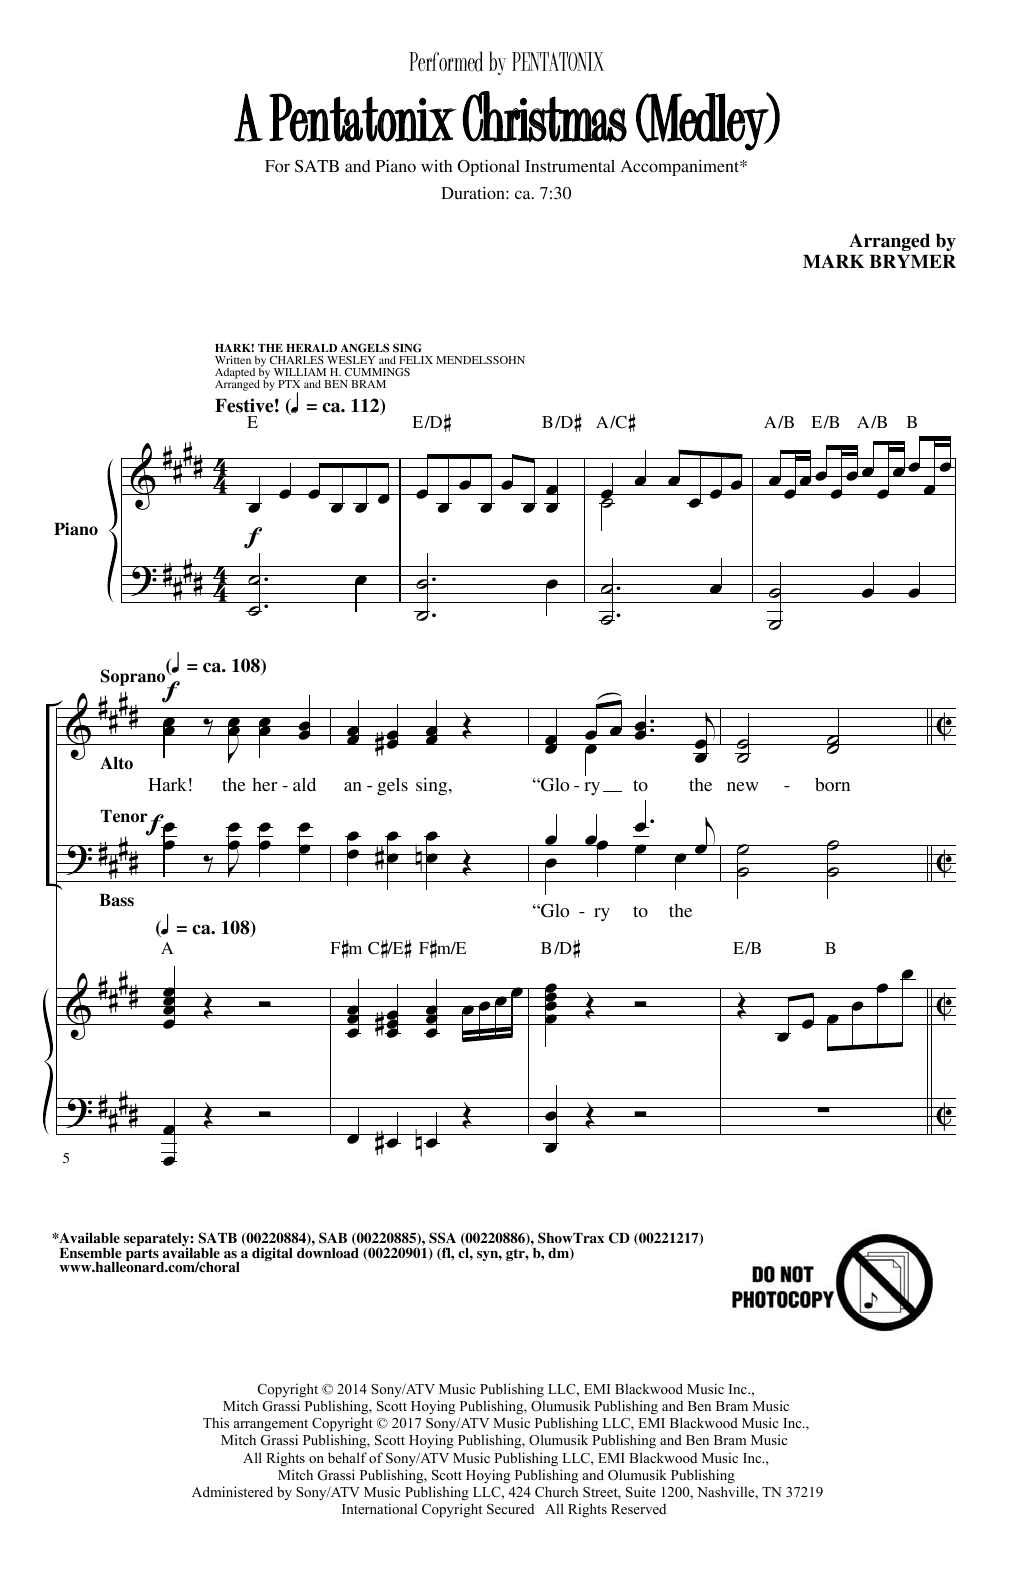 A Pentatonix Christmas (Medley) (arr. Mark Brymer) (SATB Choir)